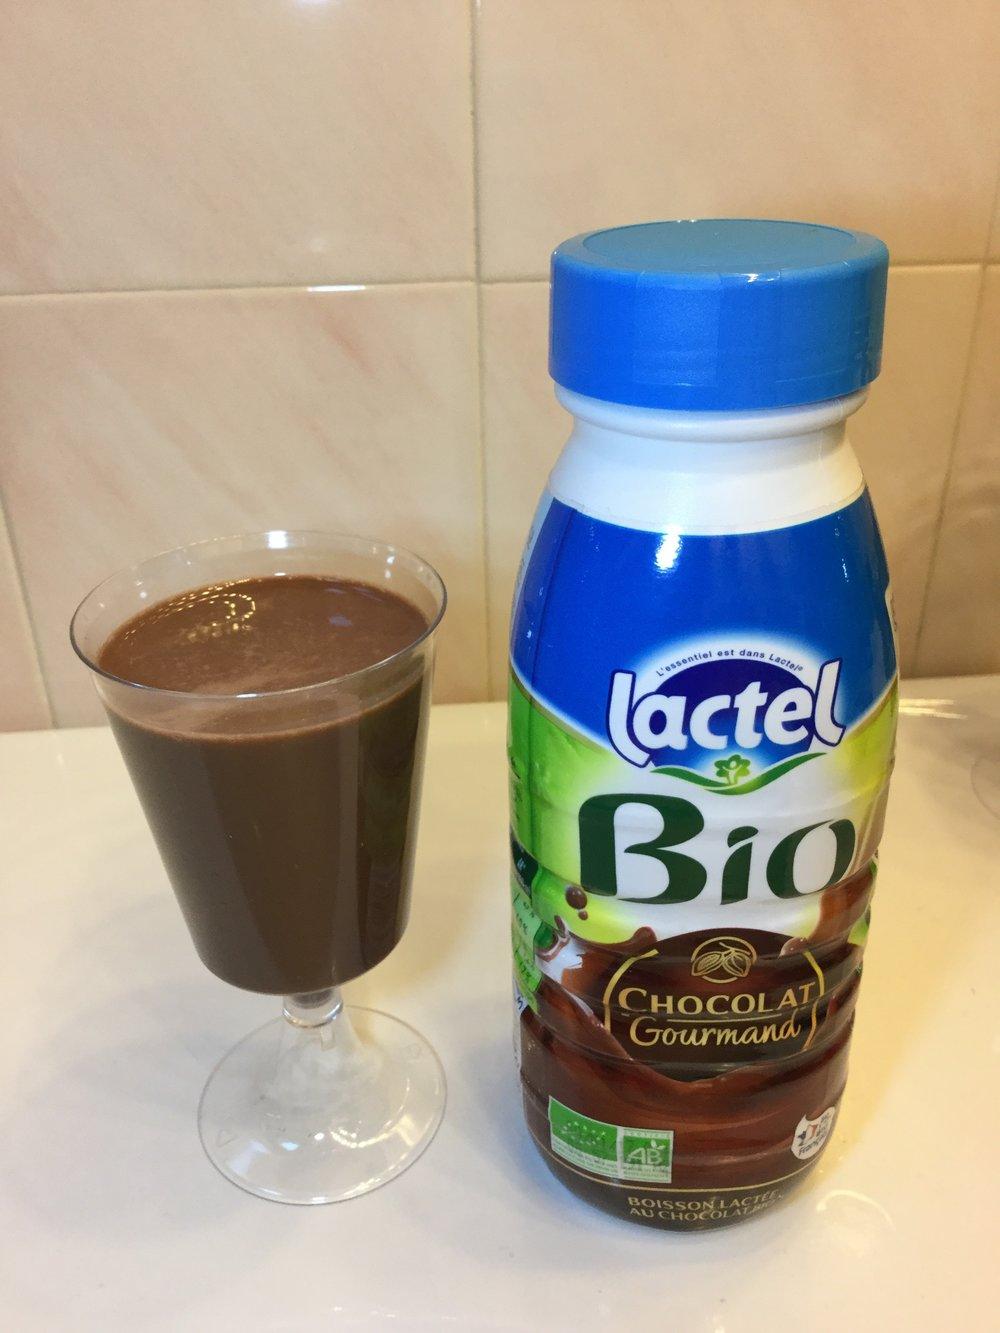 Lactel Bio Chocolat Gourmand Cup